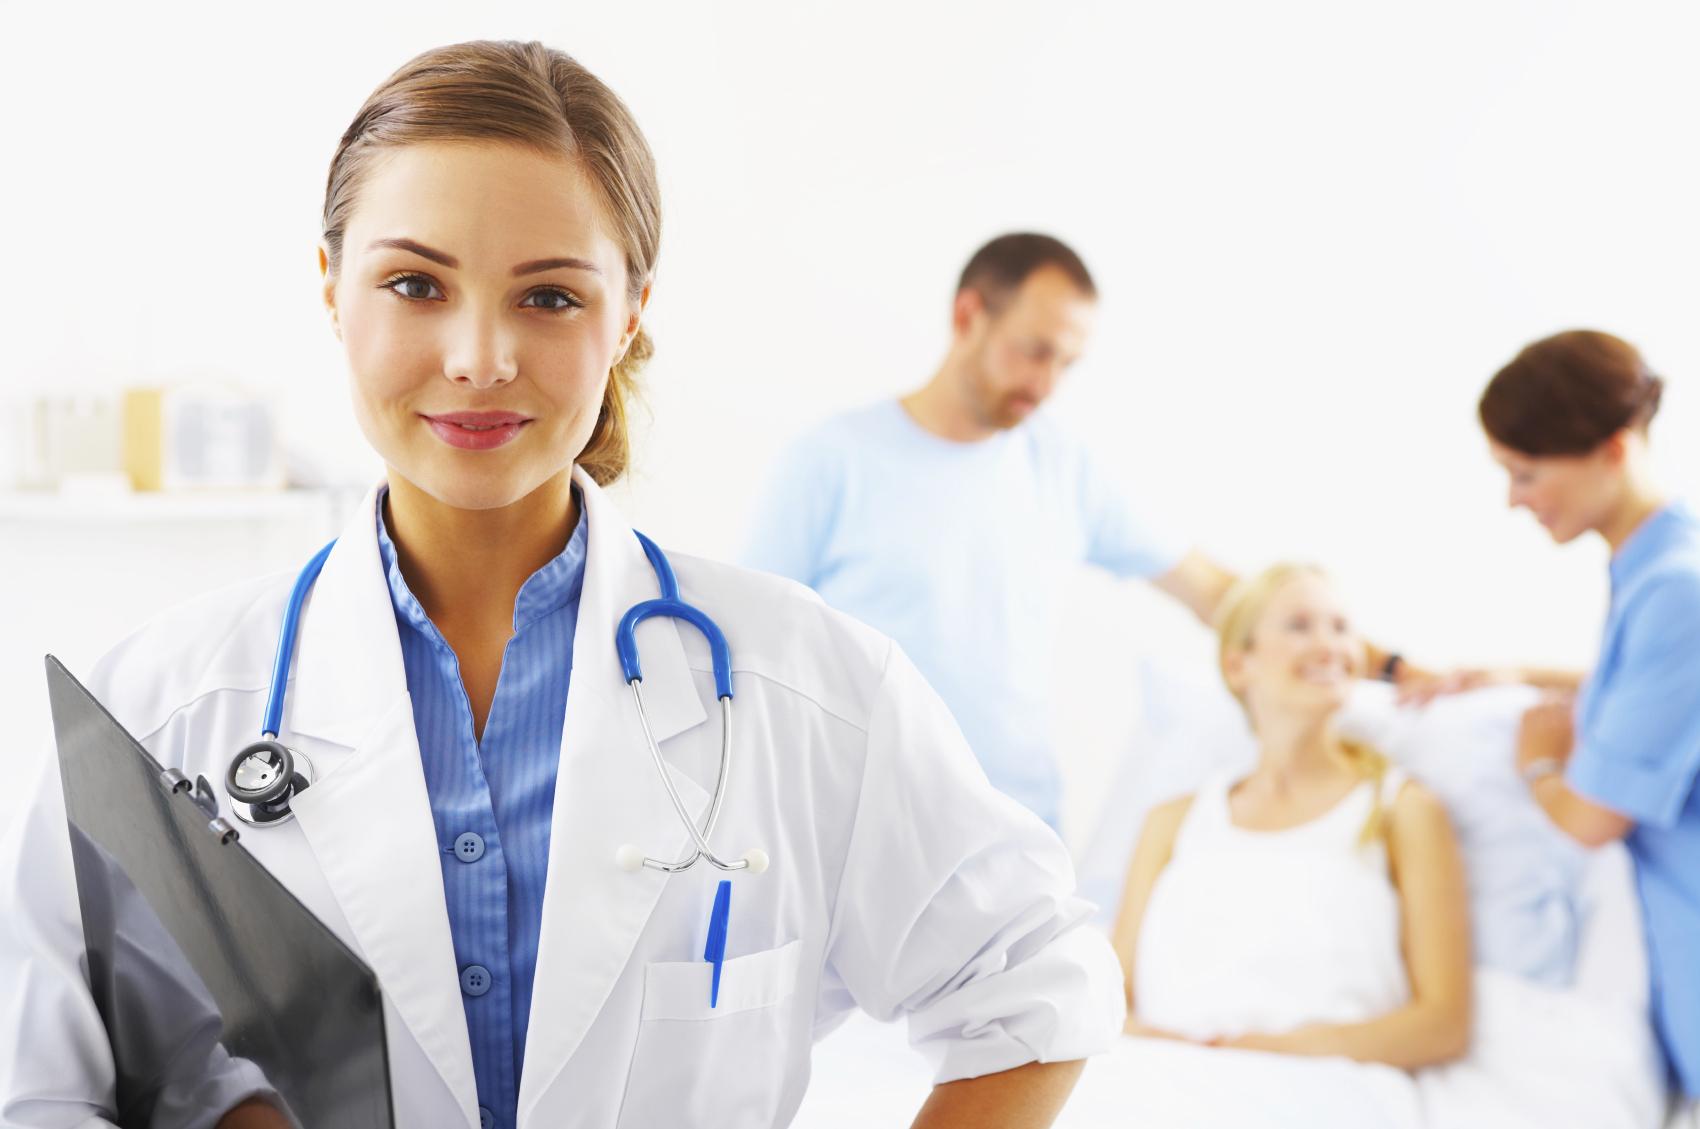 Medical_Professional_stock.jpg